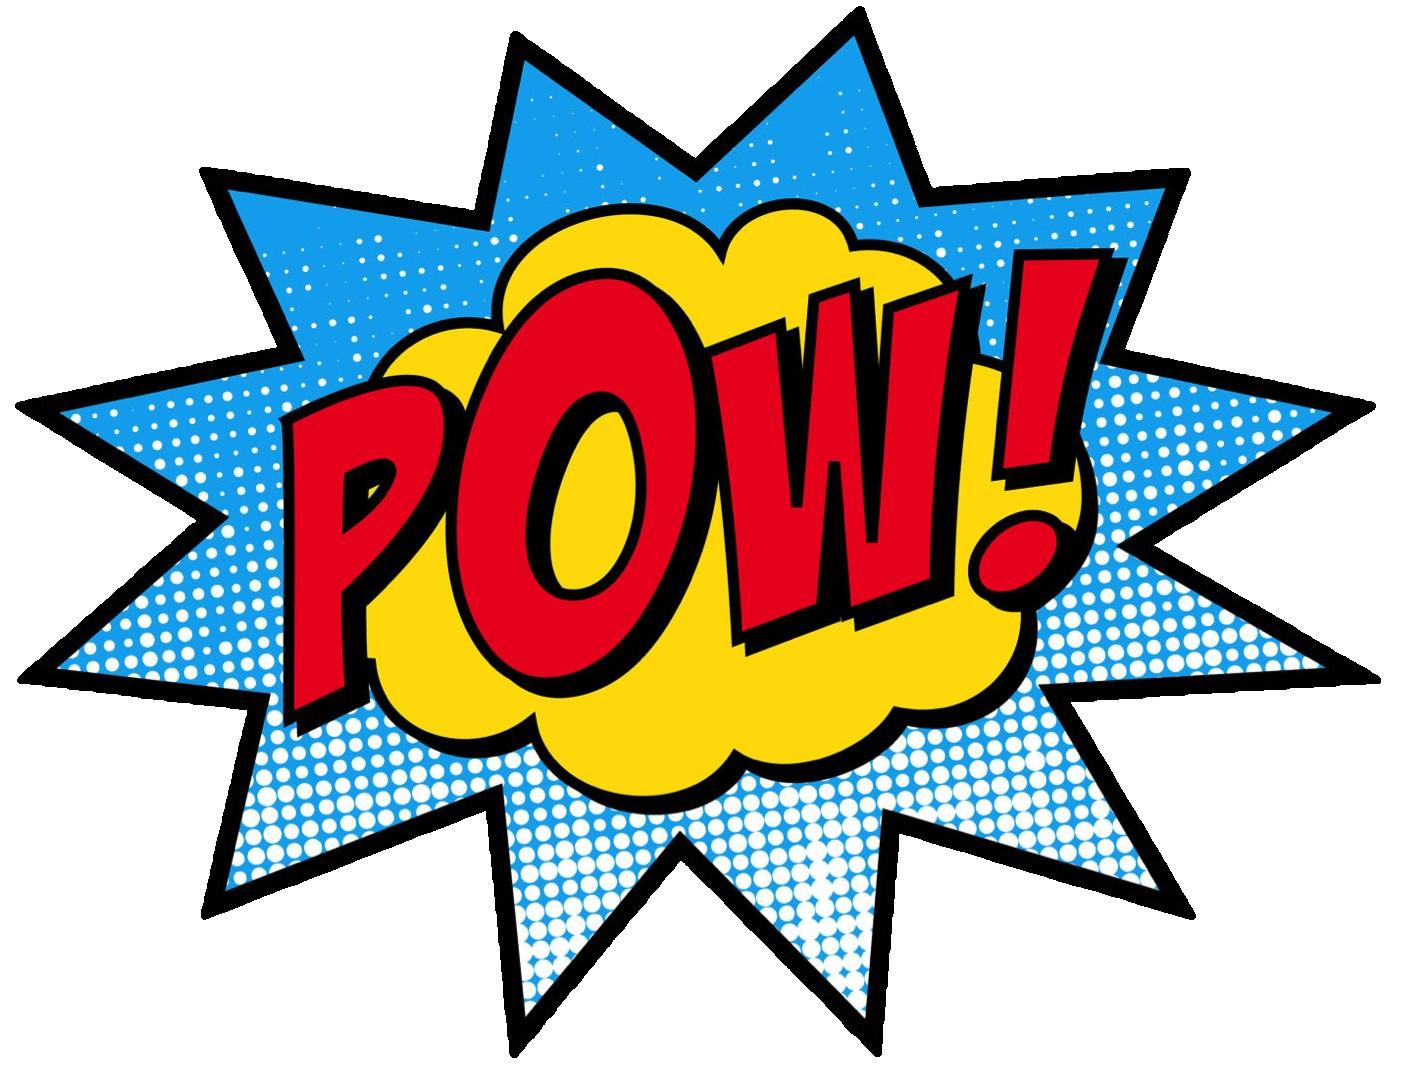 flash superhero clipart at getdrawings com free for personal use rh getdrawings com superhero clipart alphabet superhero clipart free for teachers